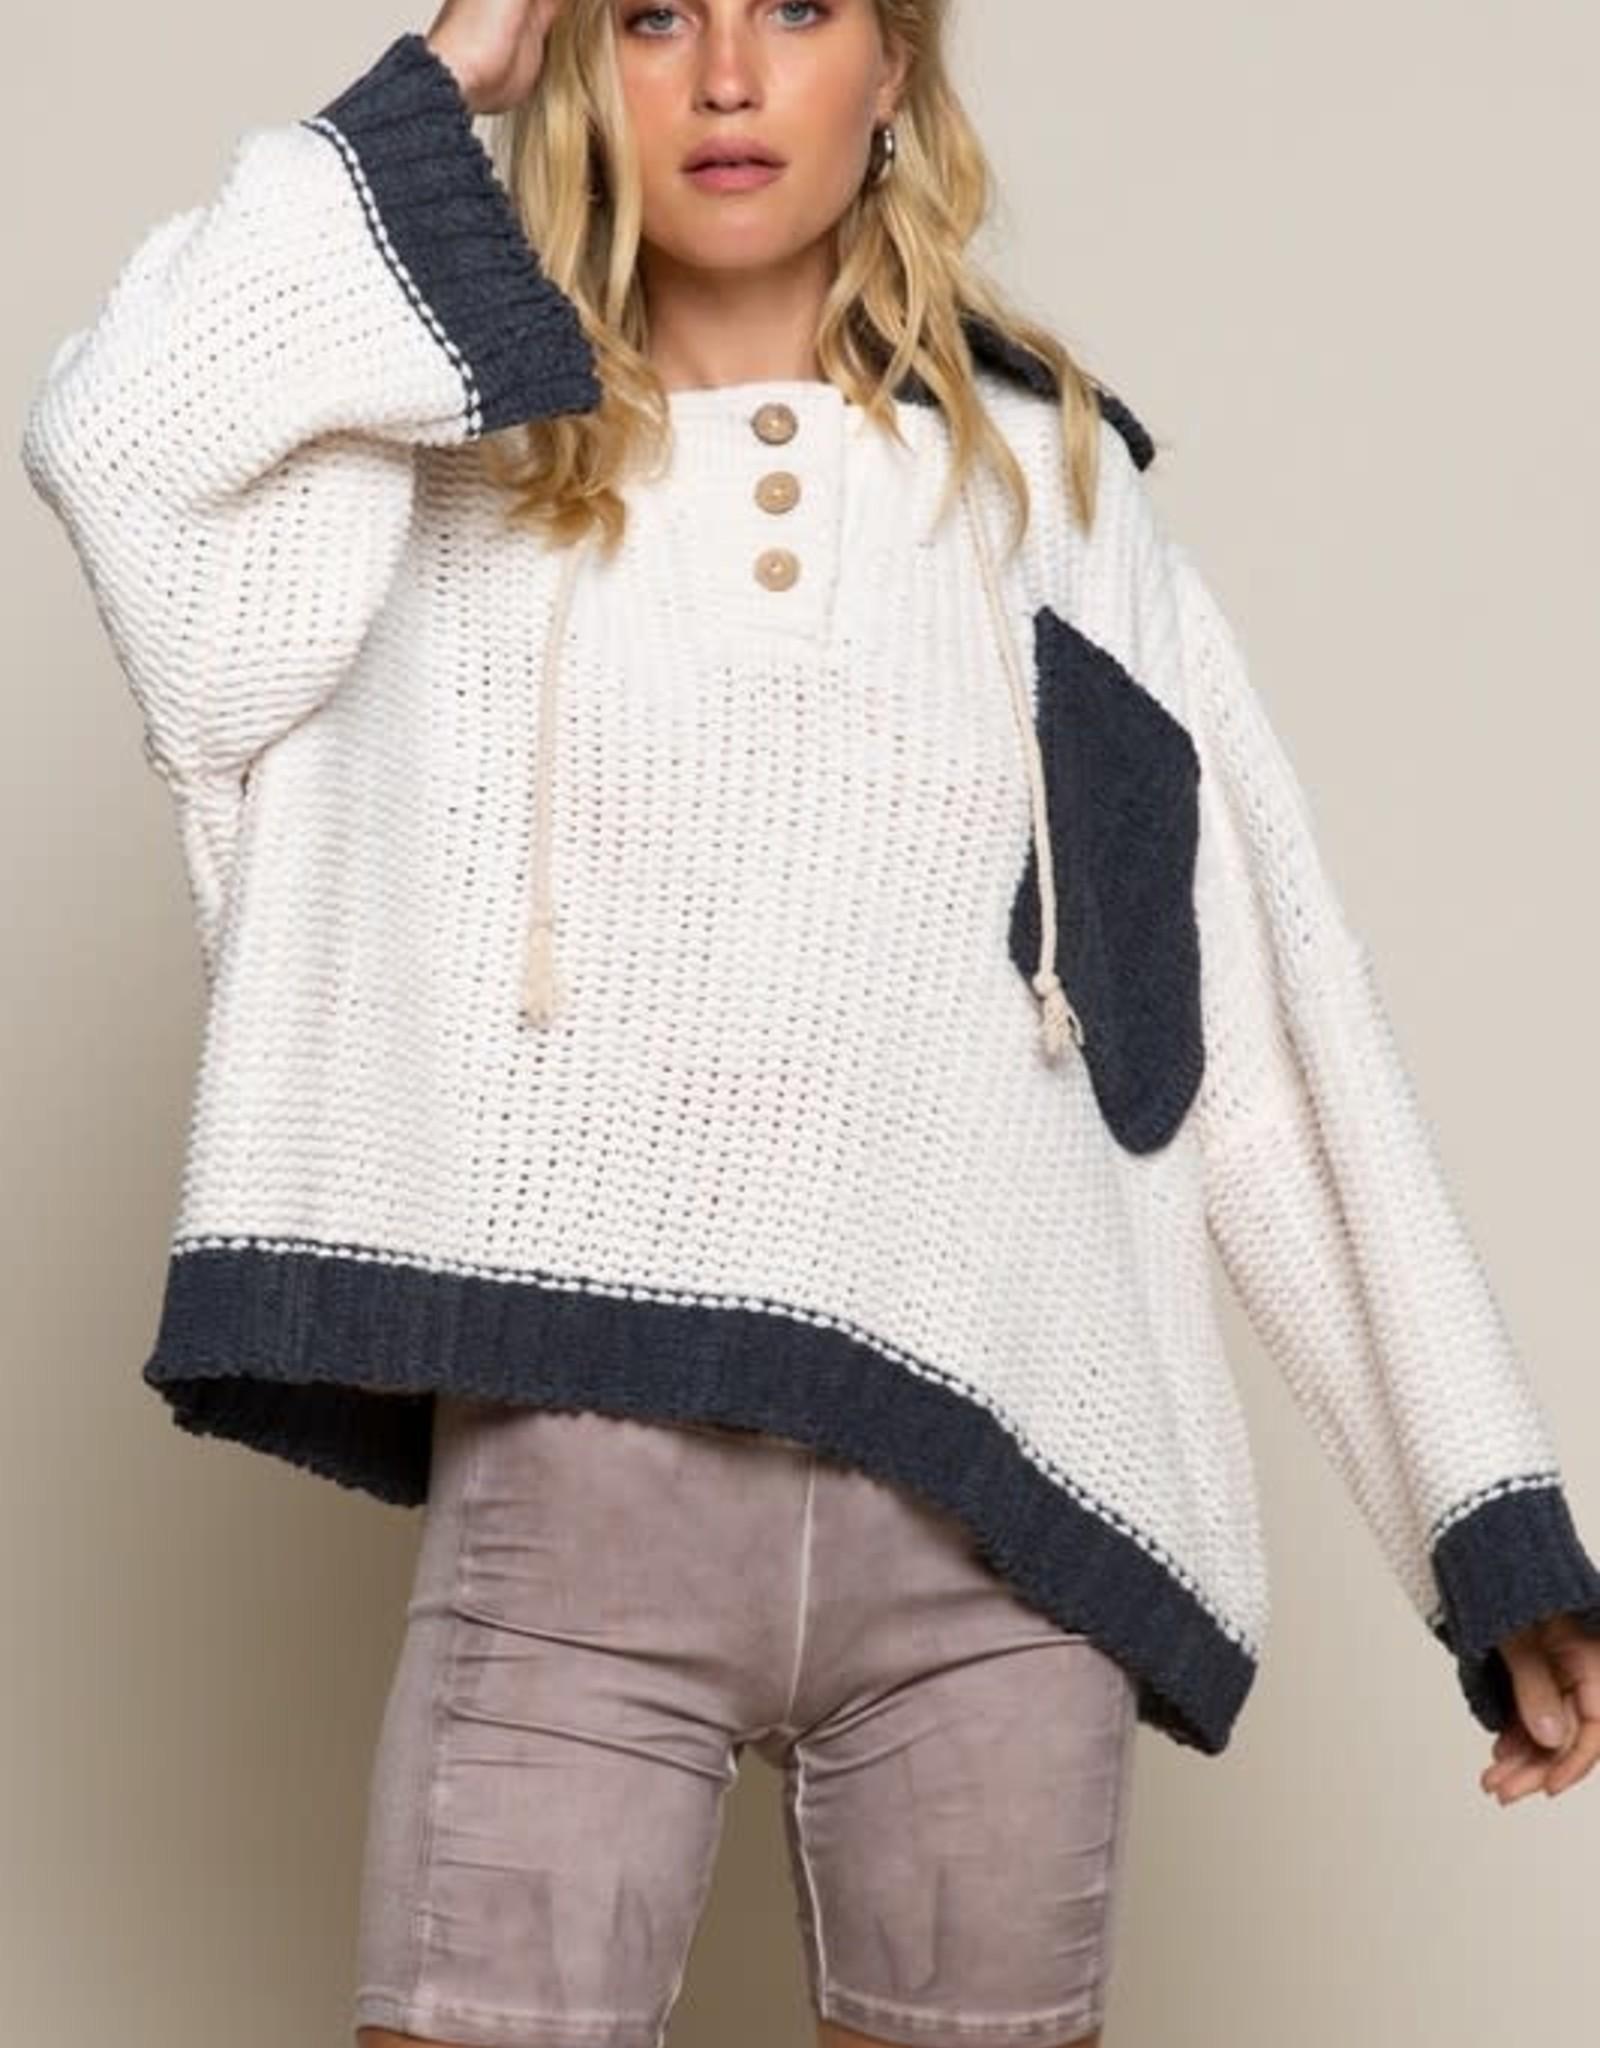 Pocket Stitched Sweater